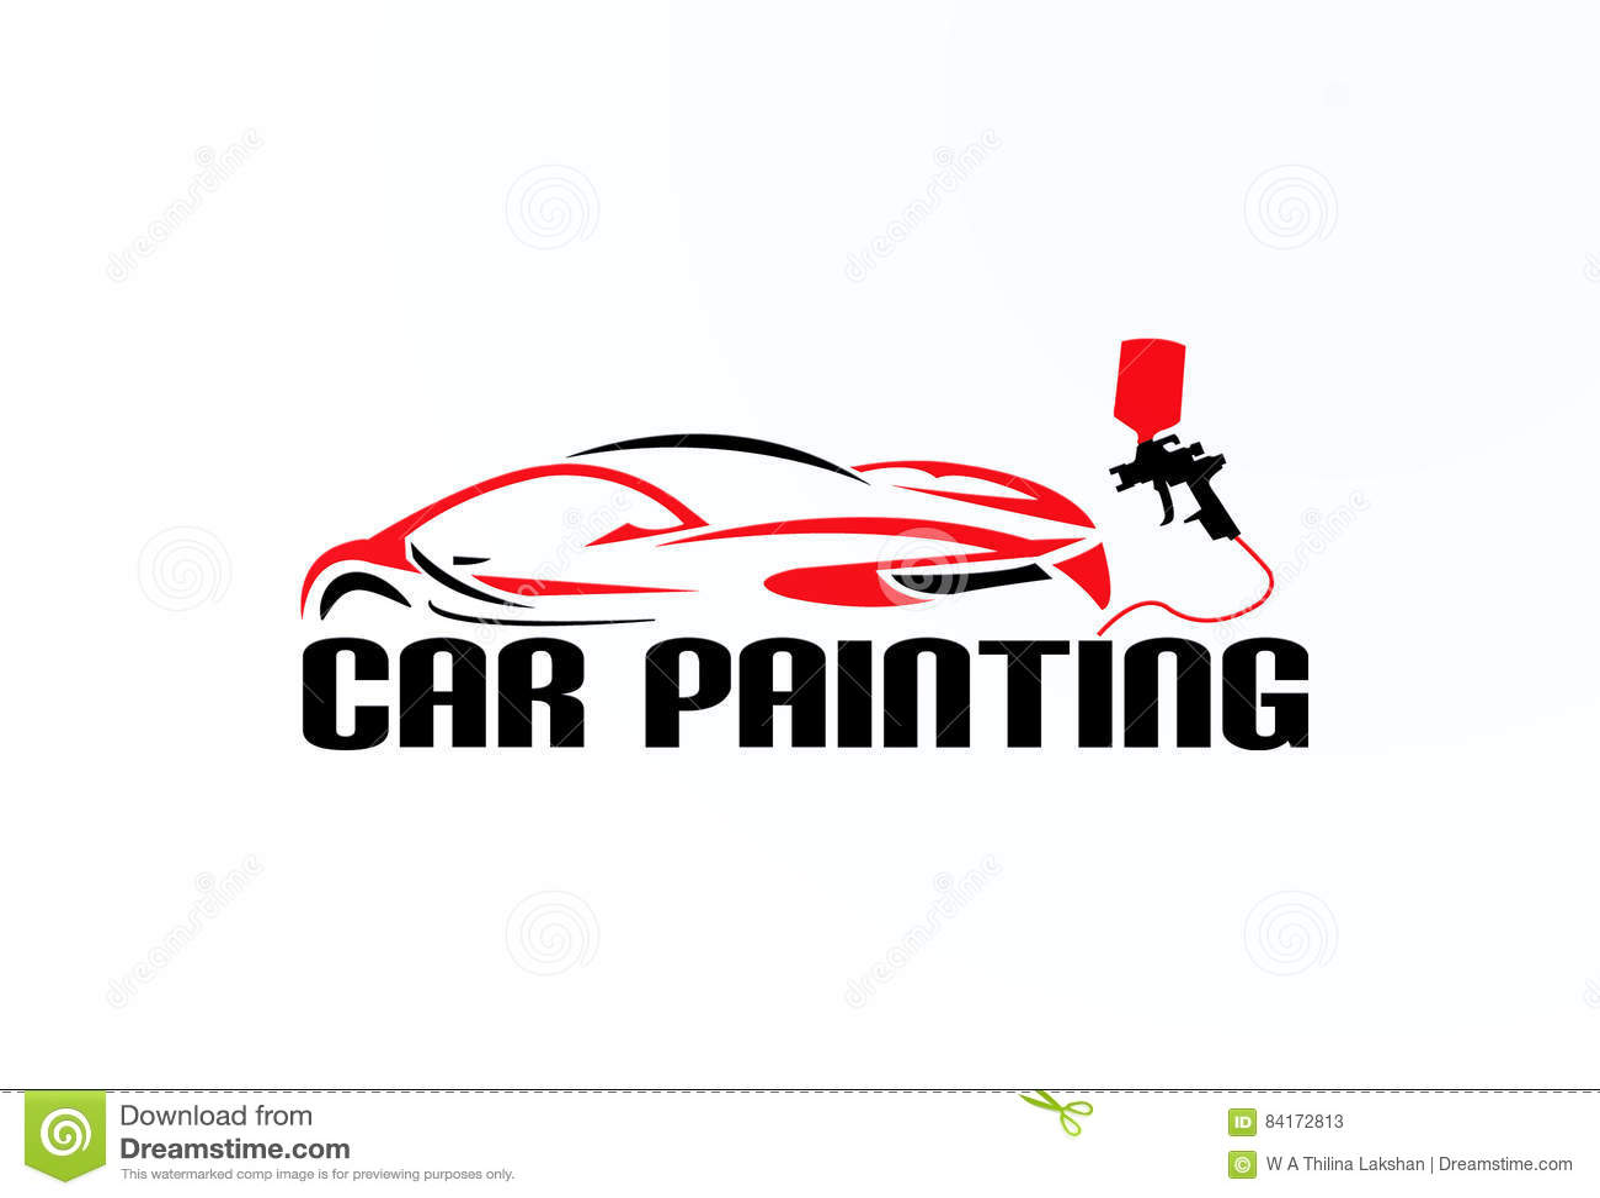 Car Painting Logo Vector Design Stock Vector - Image: 84172813